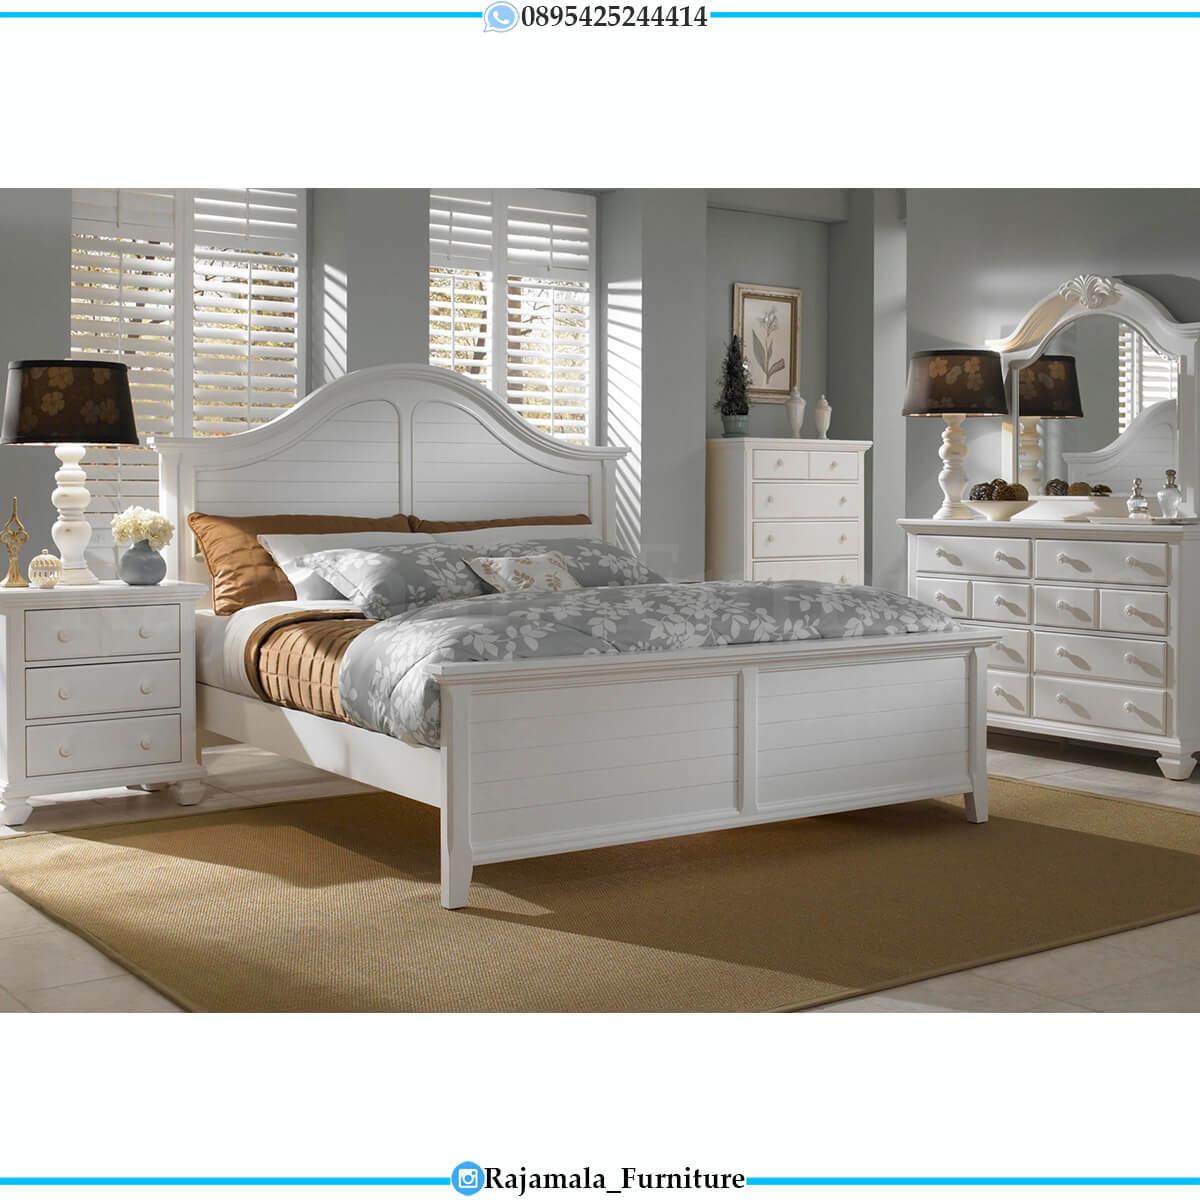 New Style Tempat Tidur Minimalis Furniture Jepara Luxury RM-0642